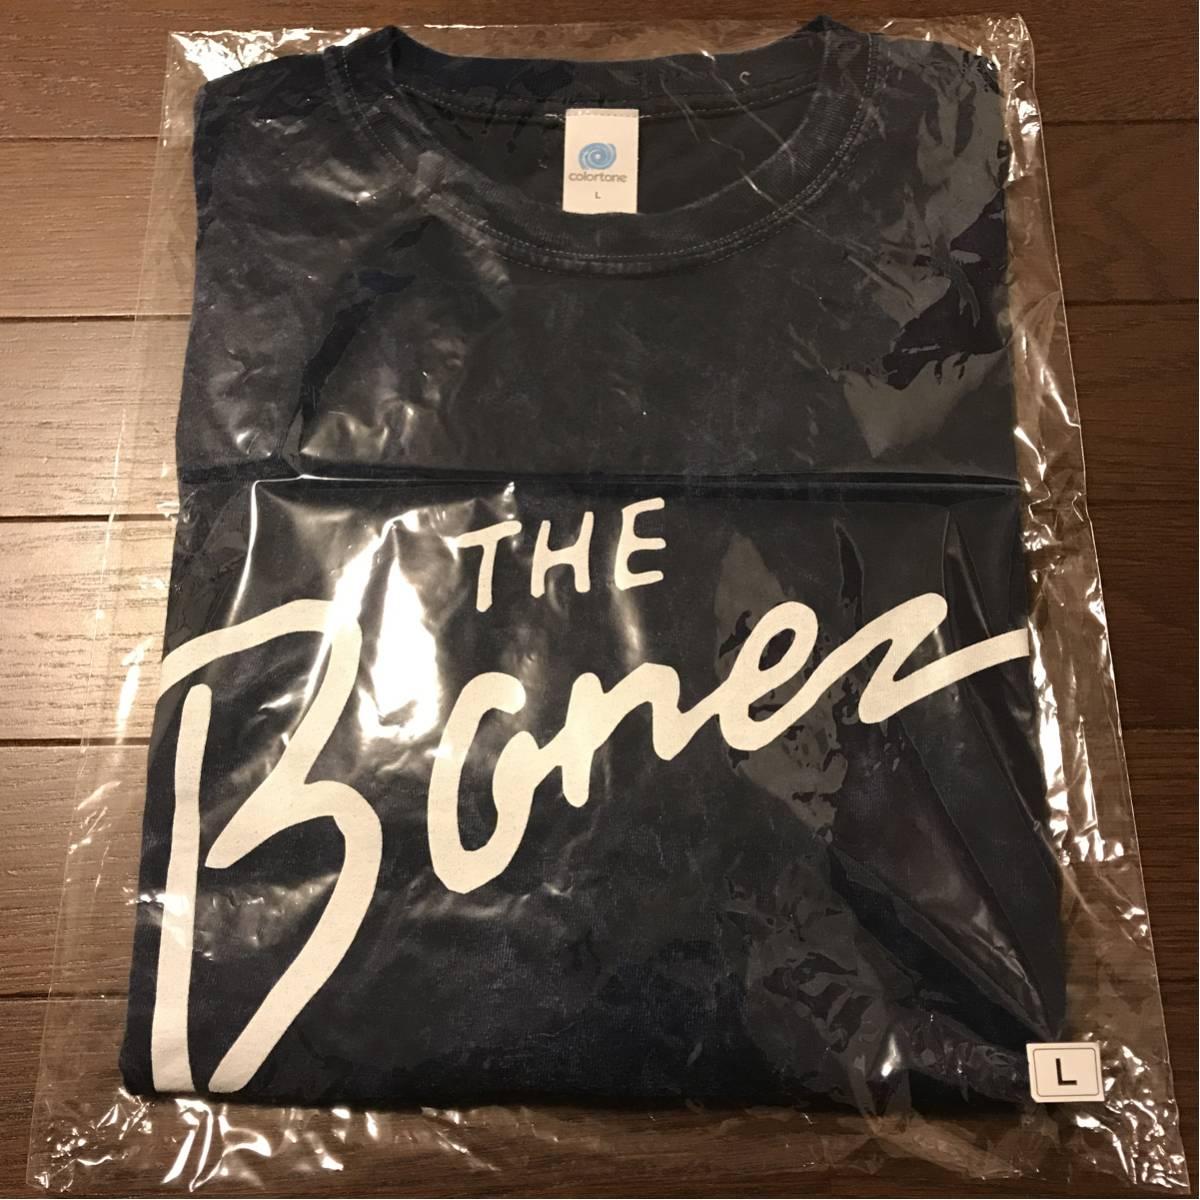 The BONEZ ミネラルウォッシュ Tシャツ ブルー Lサイズ RIZE JESSE PTP dragon ash kj ライブグッズの画像